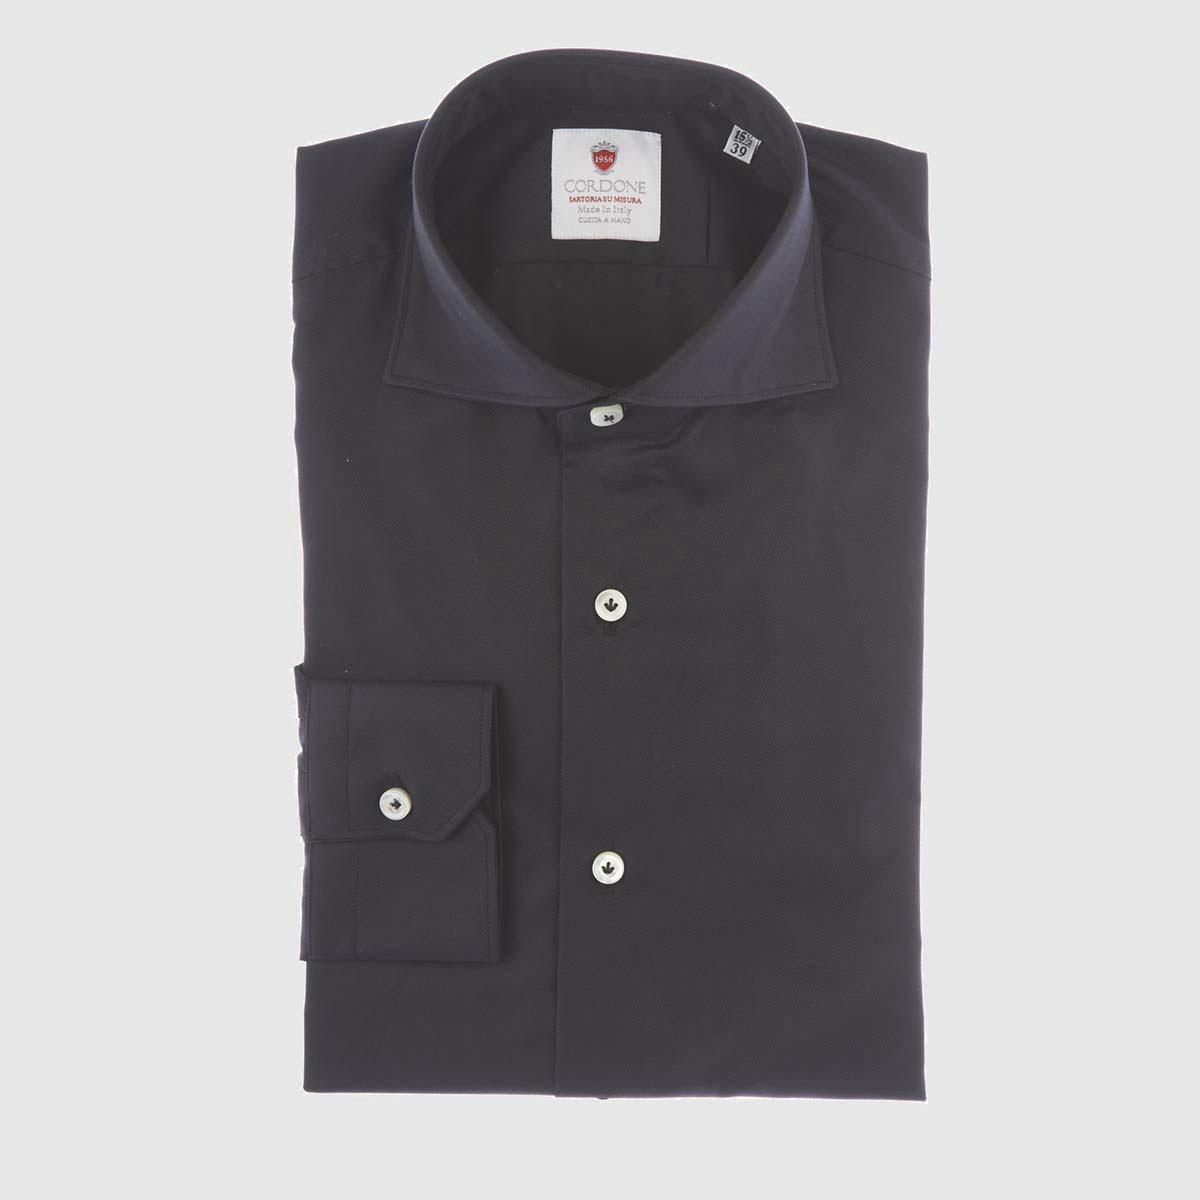 Total Black Cordone 1956 Oxford shirt